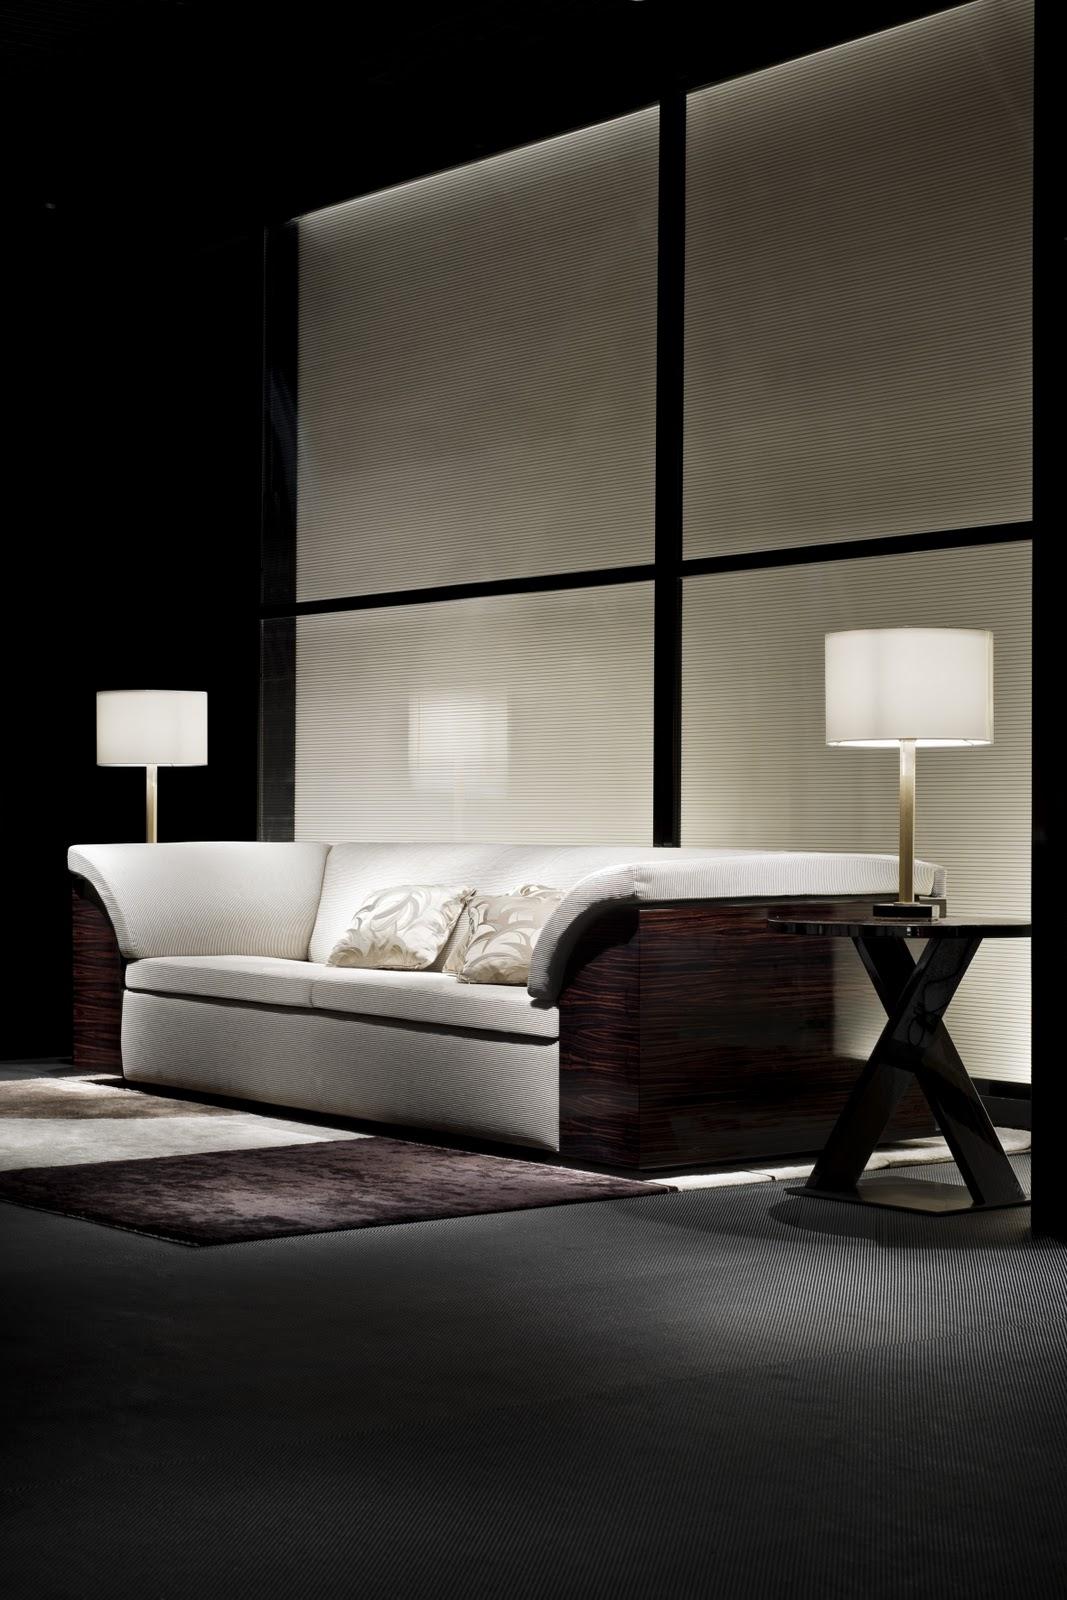 Sofa Shops Chelsea Harbour Apartment Bed Top Disain Interior Armani Lifestyle